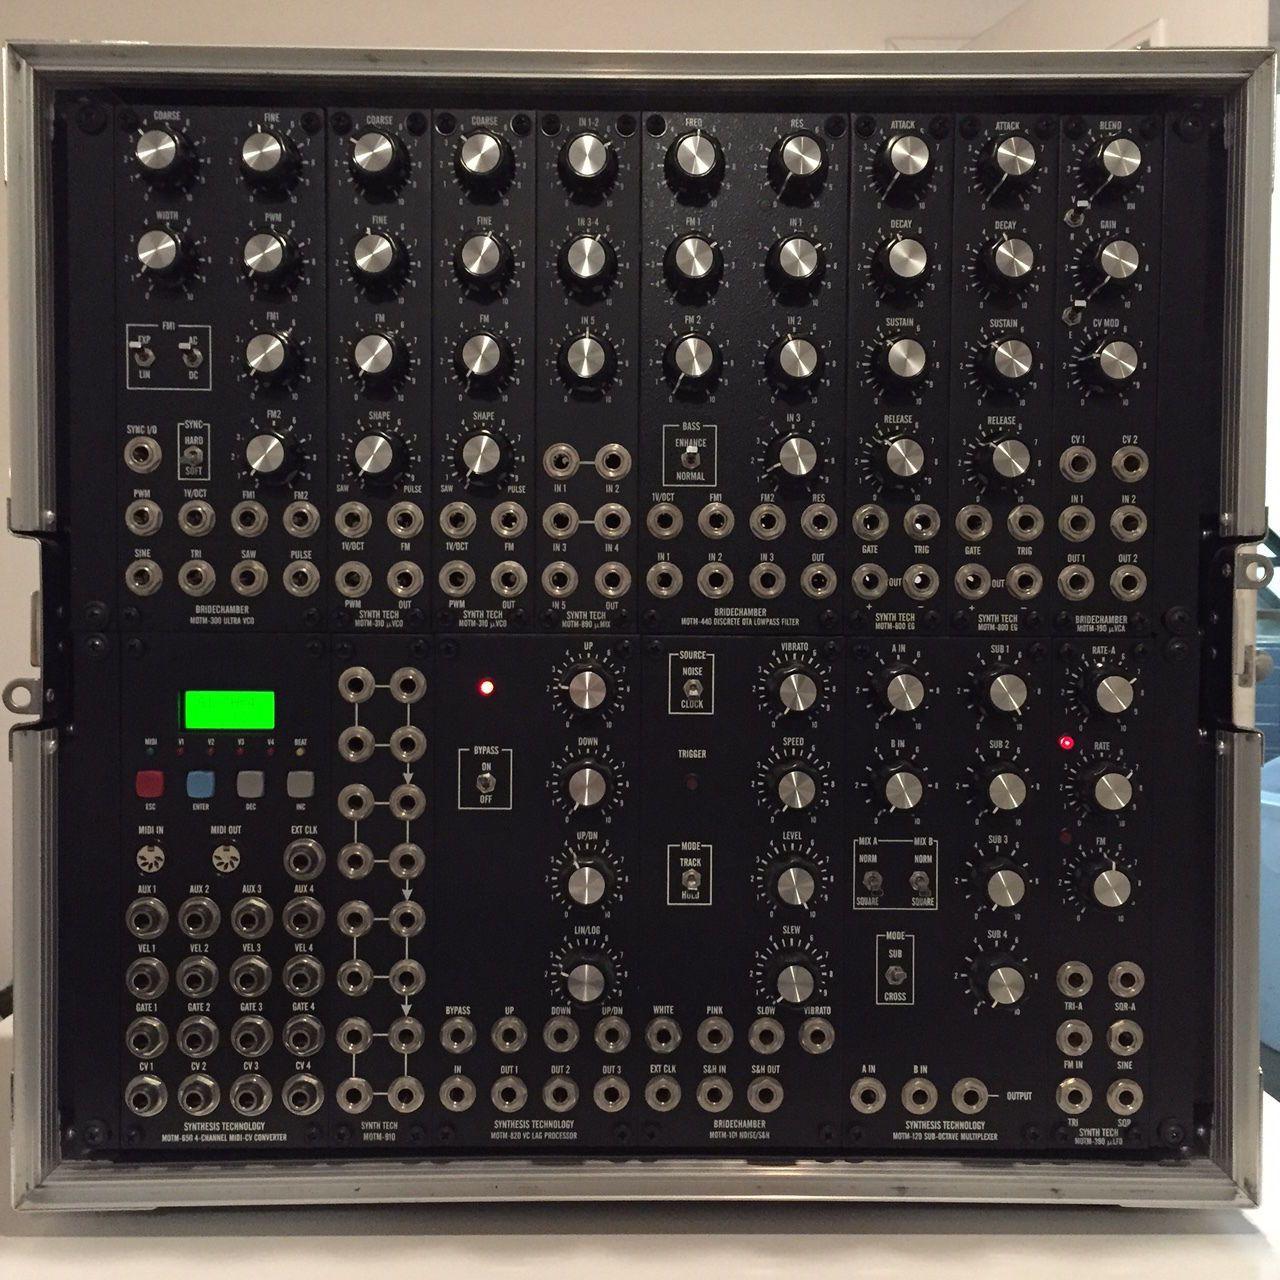 Diy synth kit for your analog eurorack modular synthesizer